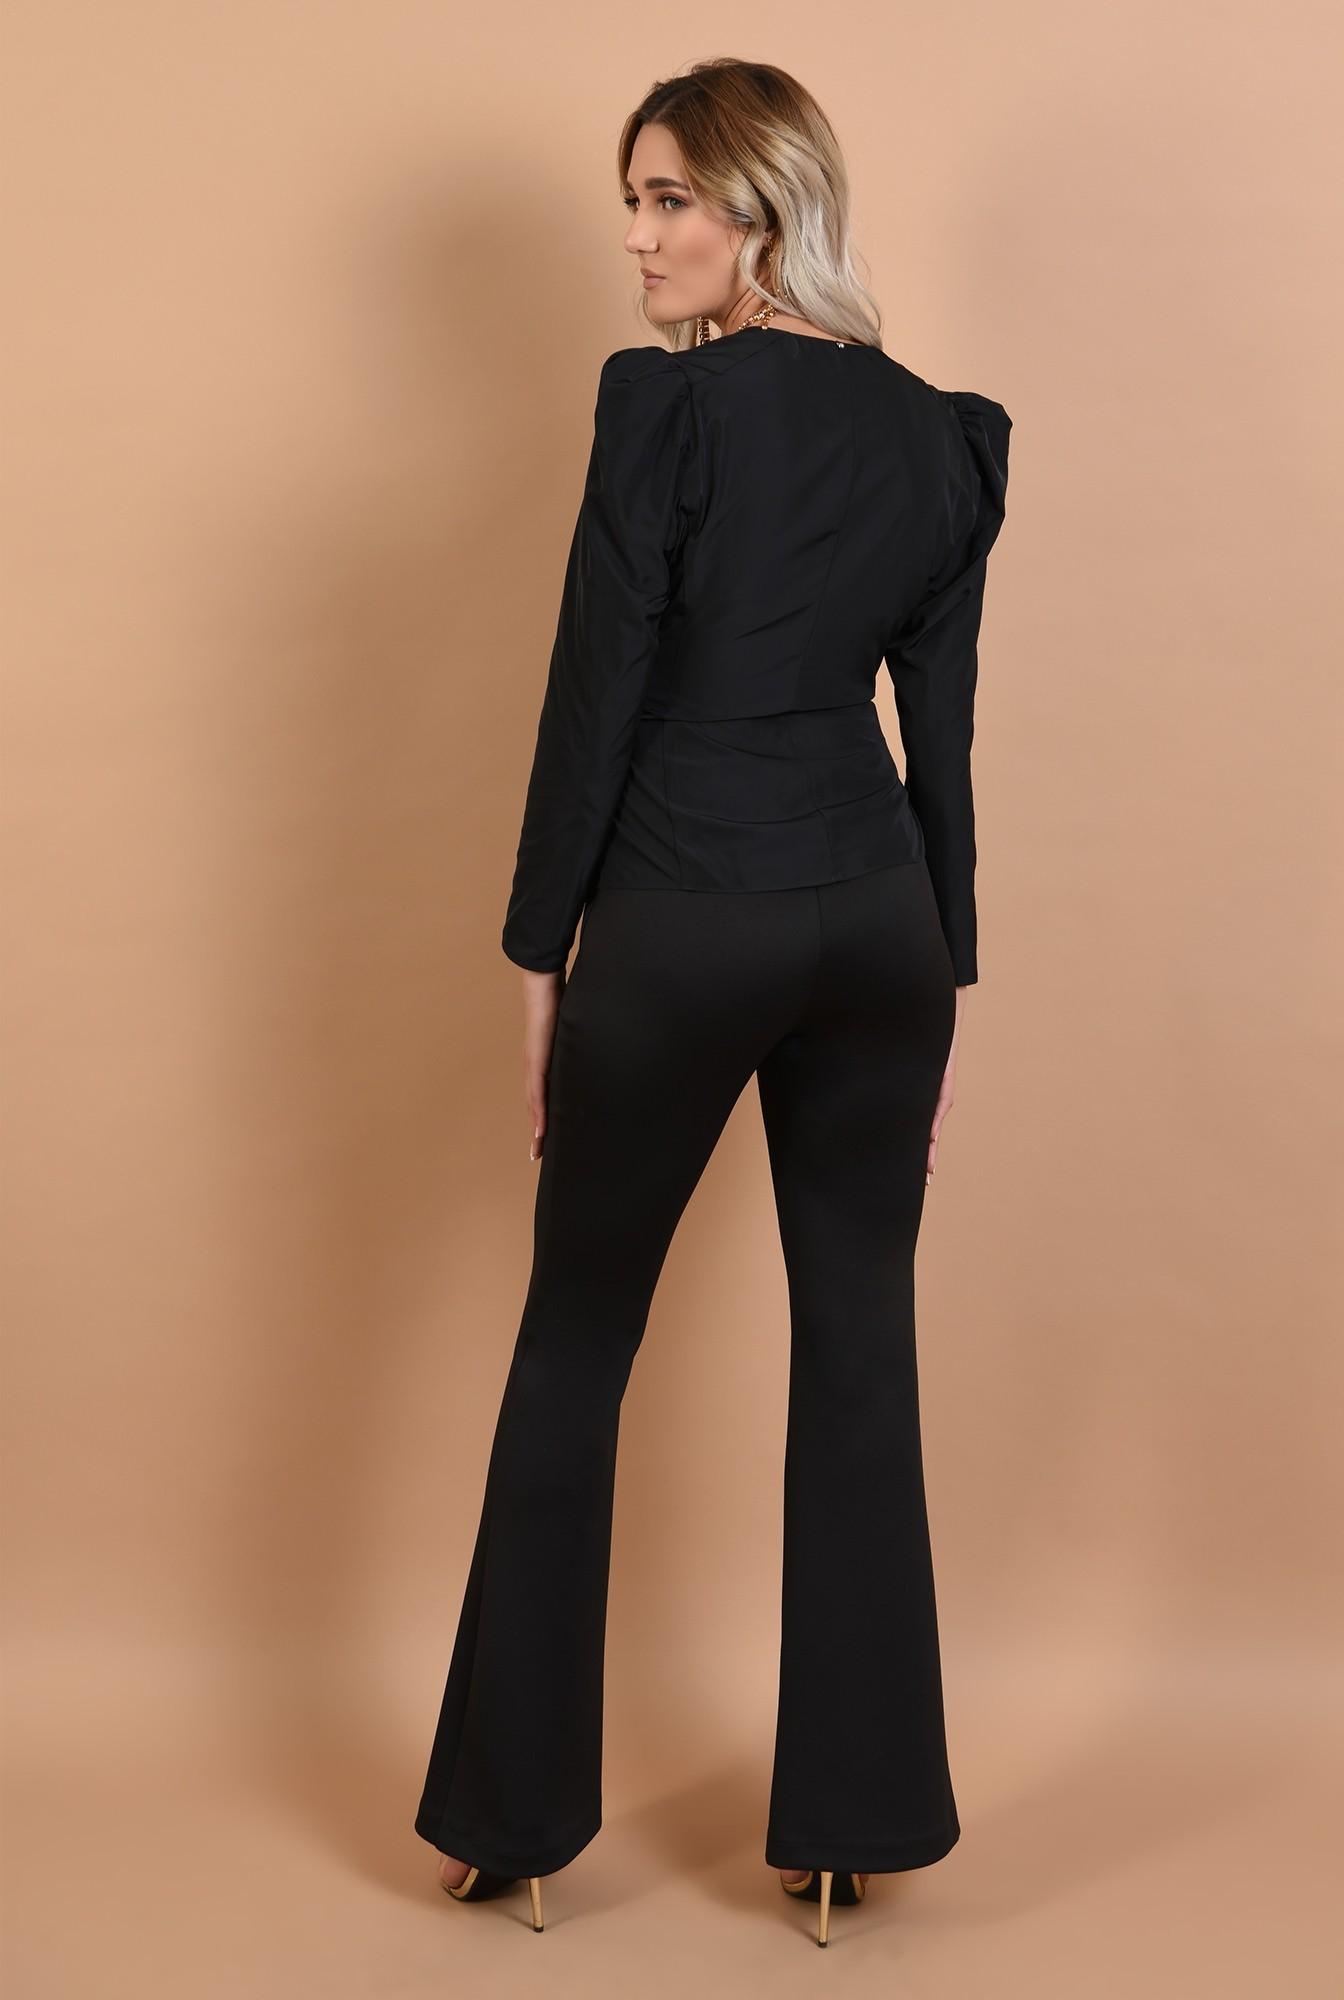 1 - bluza eleganta, neagra, cambrata, cu funda la talie, cret la umeri